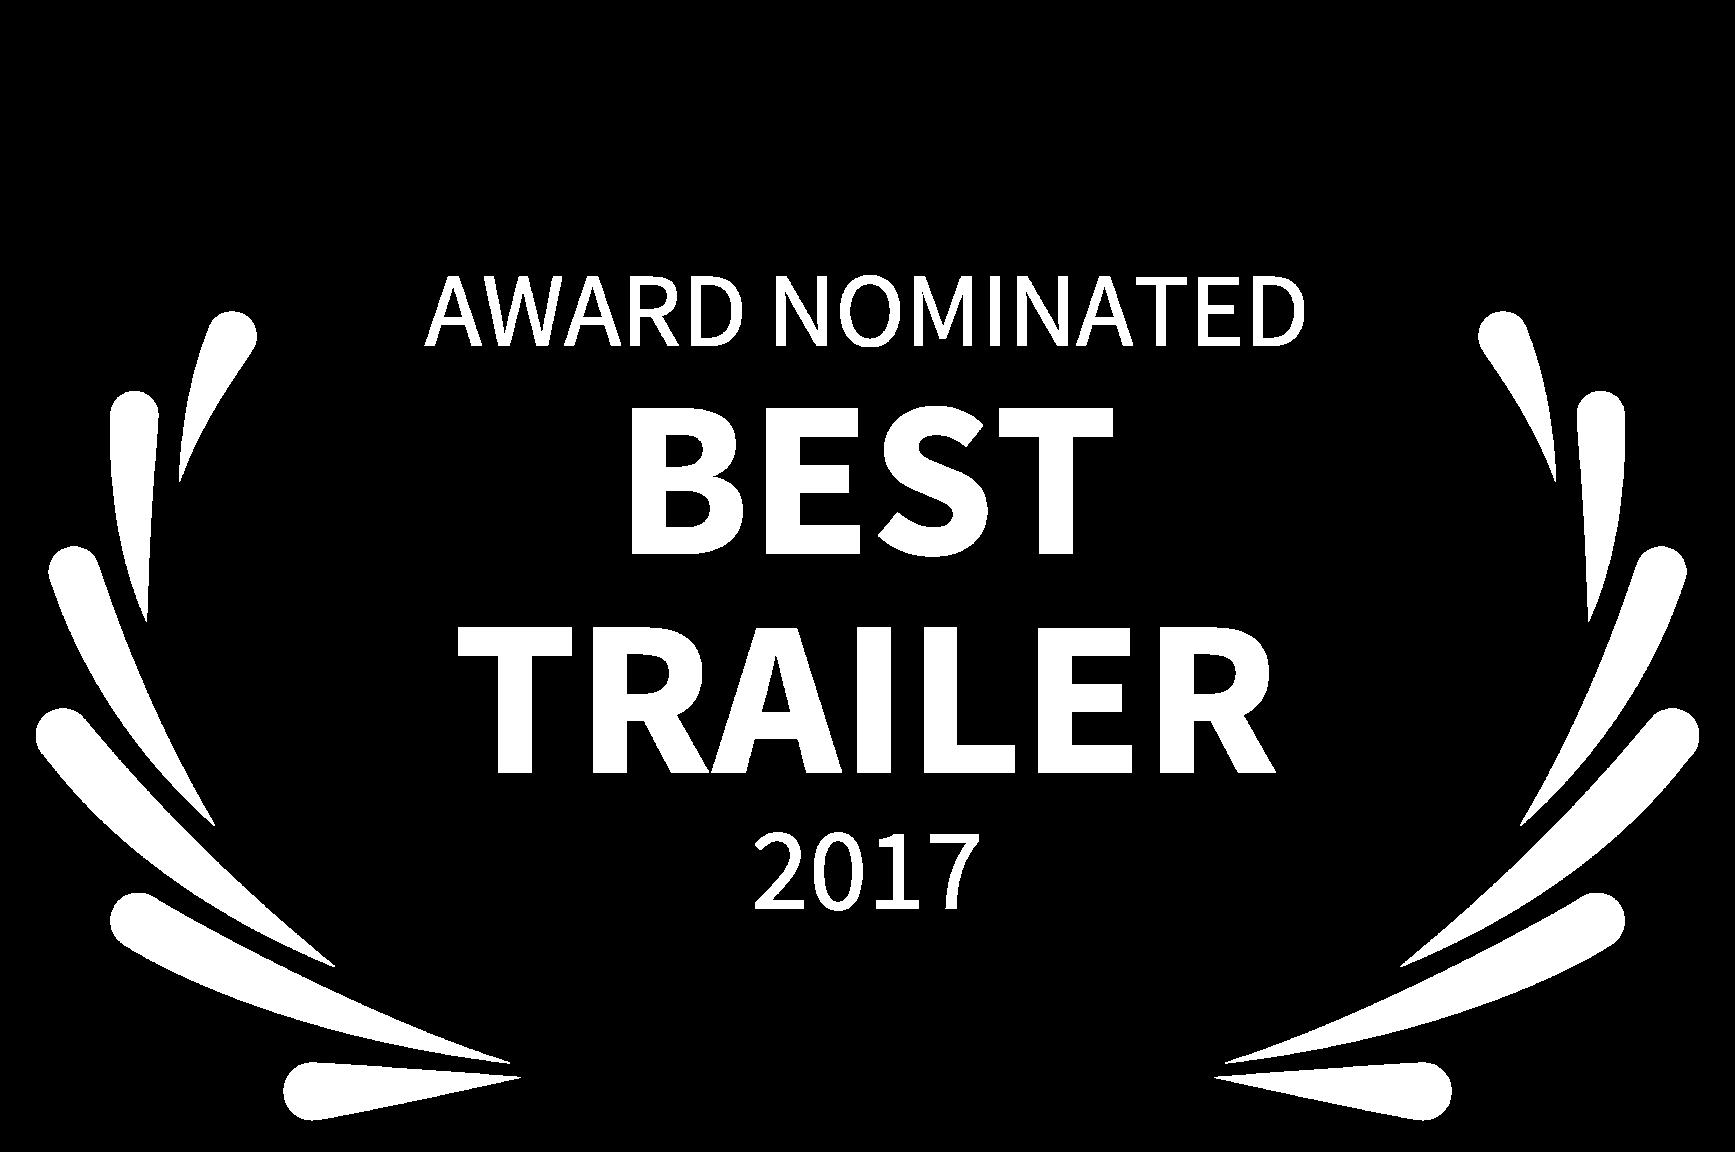 AWARD NOMINATED - BEST TRAILER - 2017.png